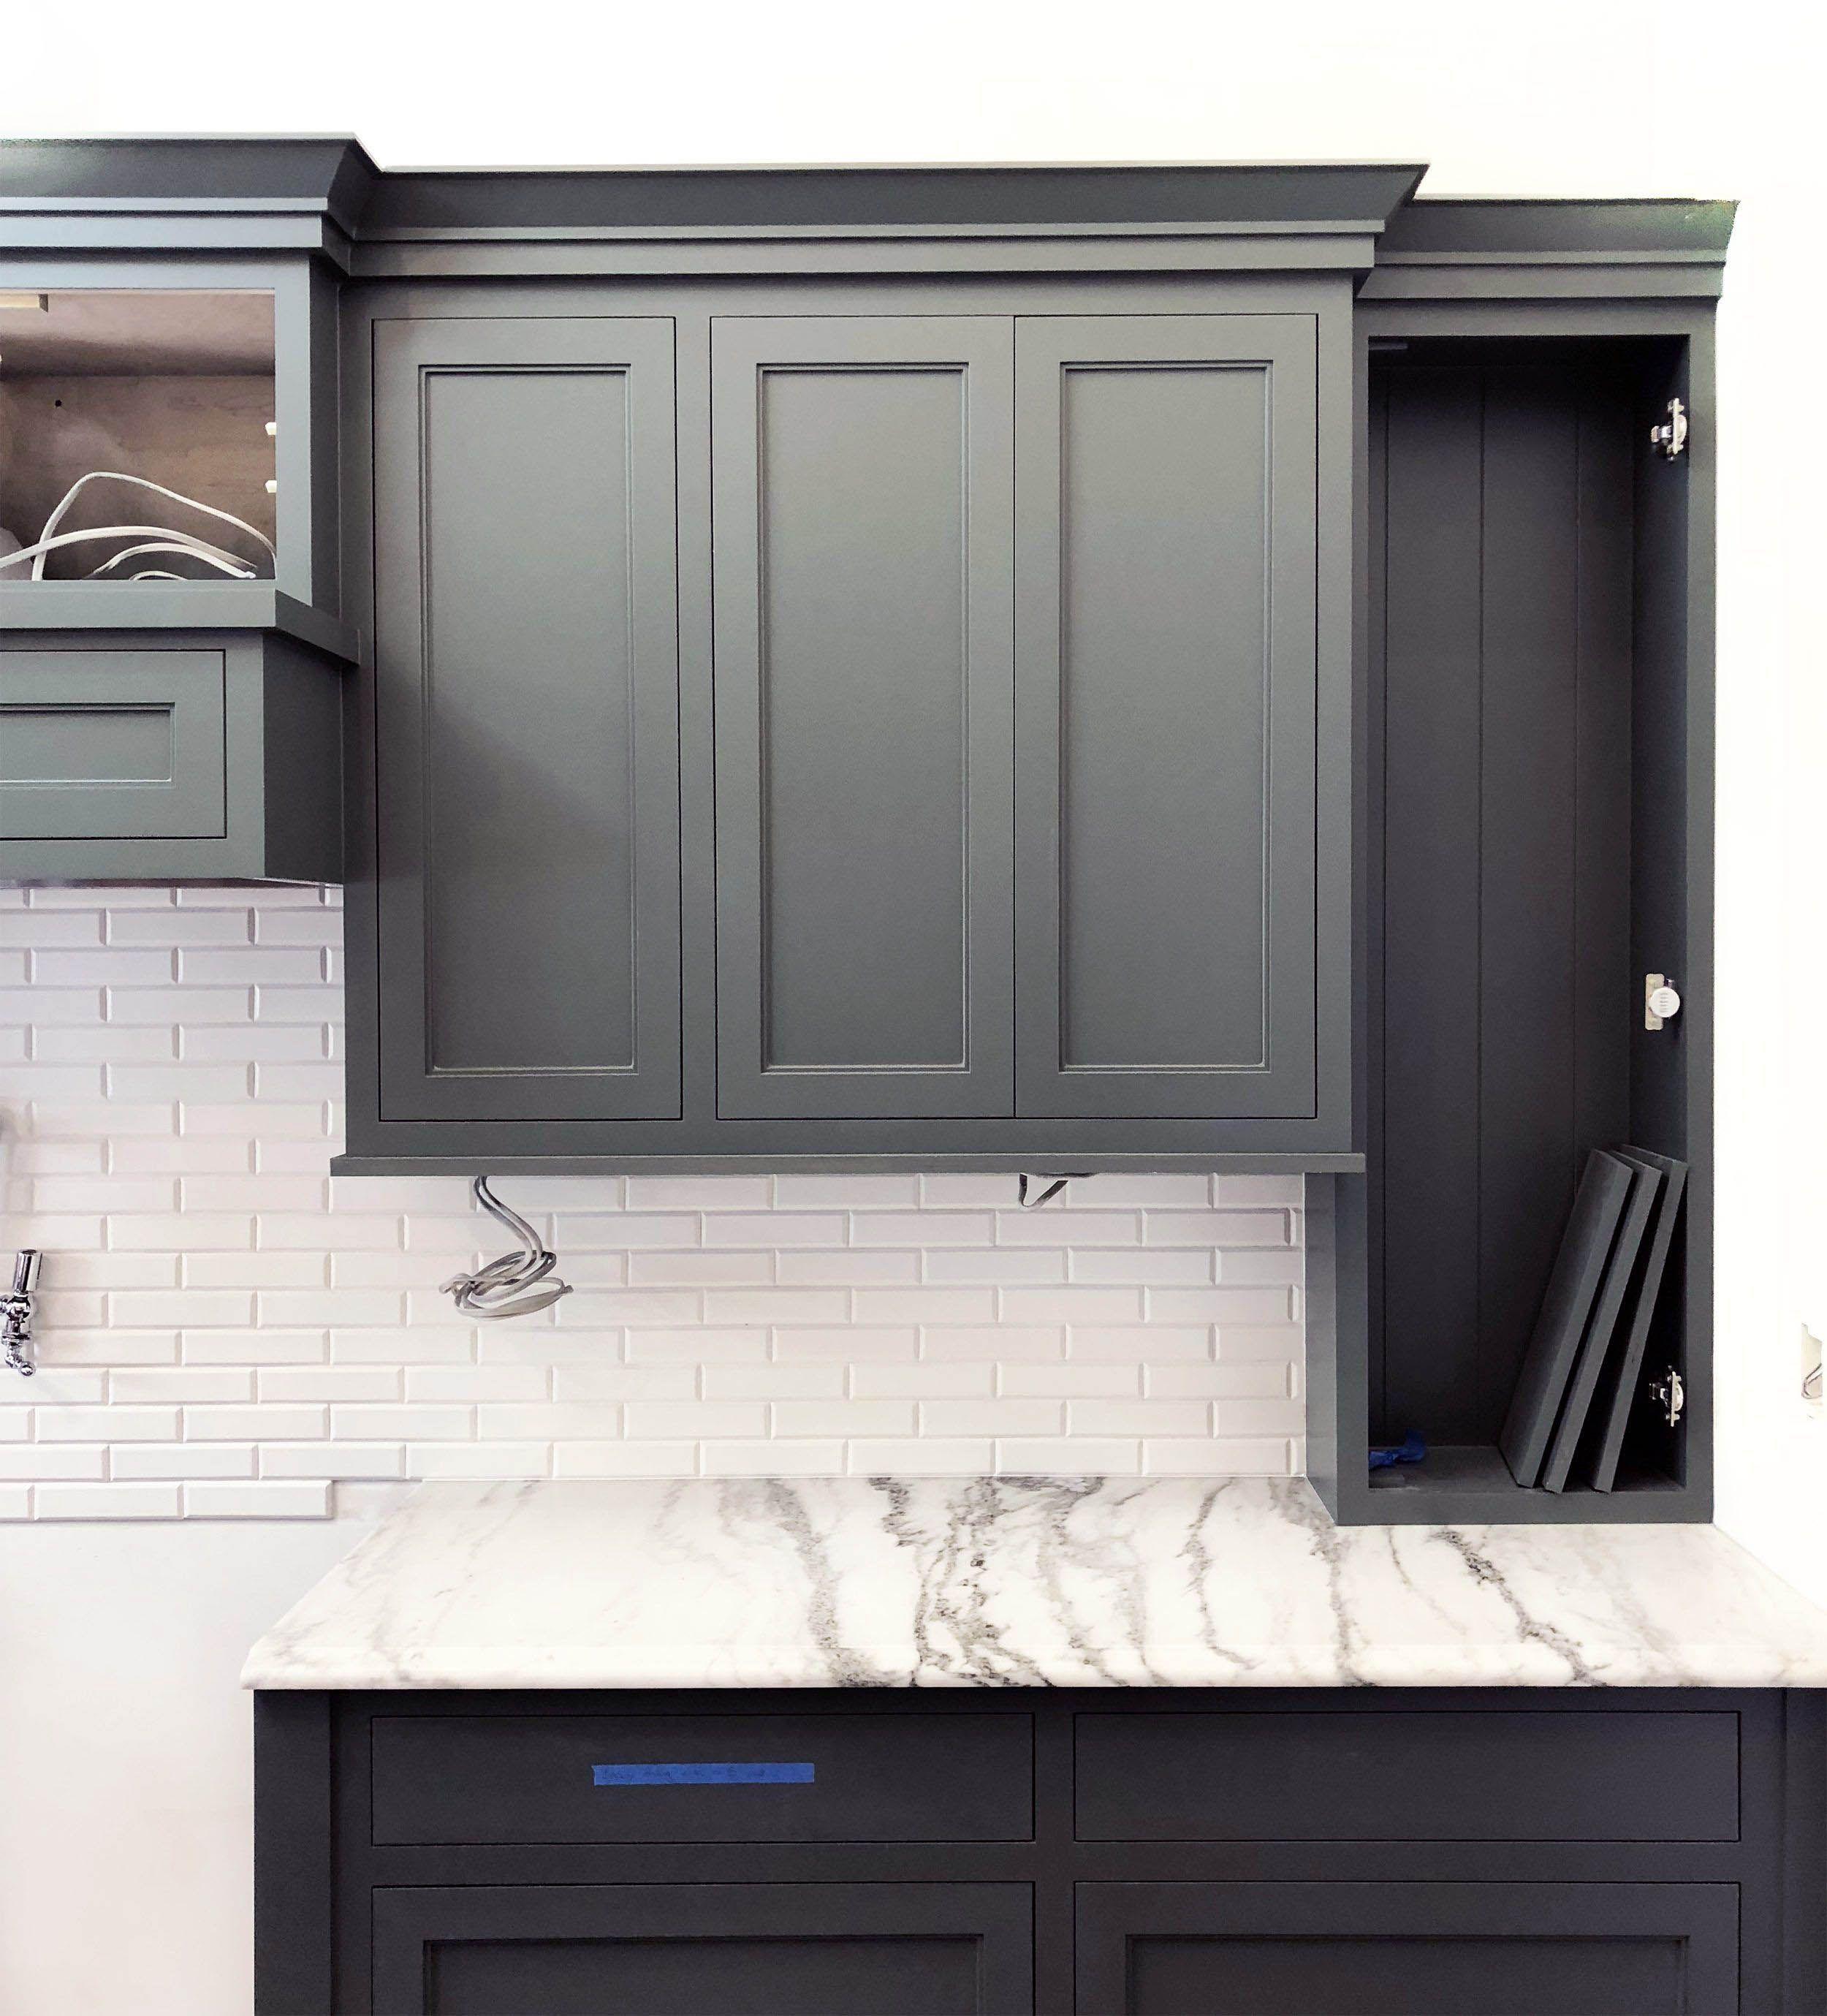 Superior Green Kitchen Cabinets Backsplash Only On Smarthomefi Com Modern Kitchen Cabinets Green Kitchen Cabinets Farmhouse Kitchen Cabinets